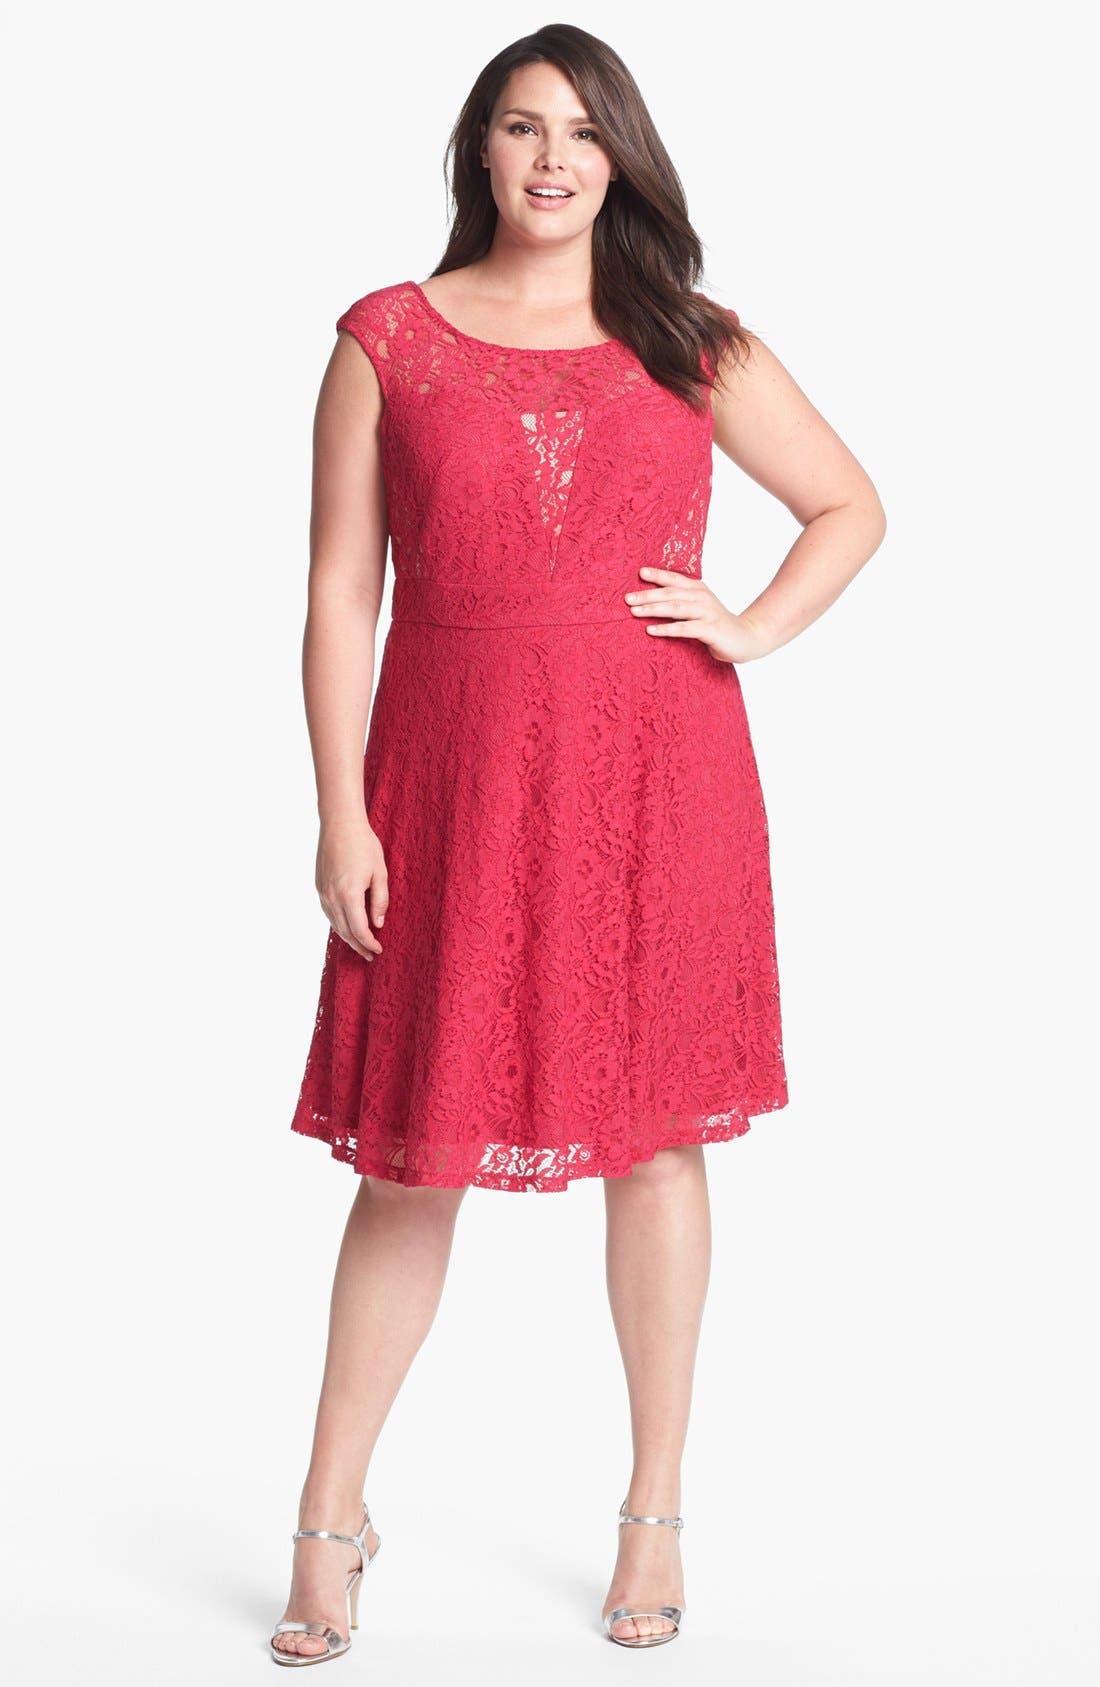 Main Image - Donna Ricco Lace Fit & Flare Dress (Plus Size)